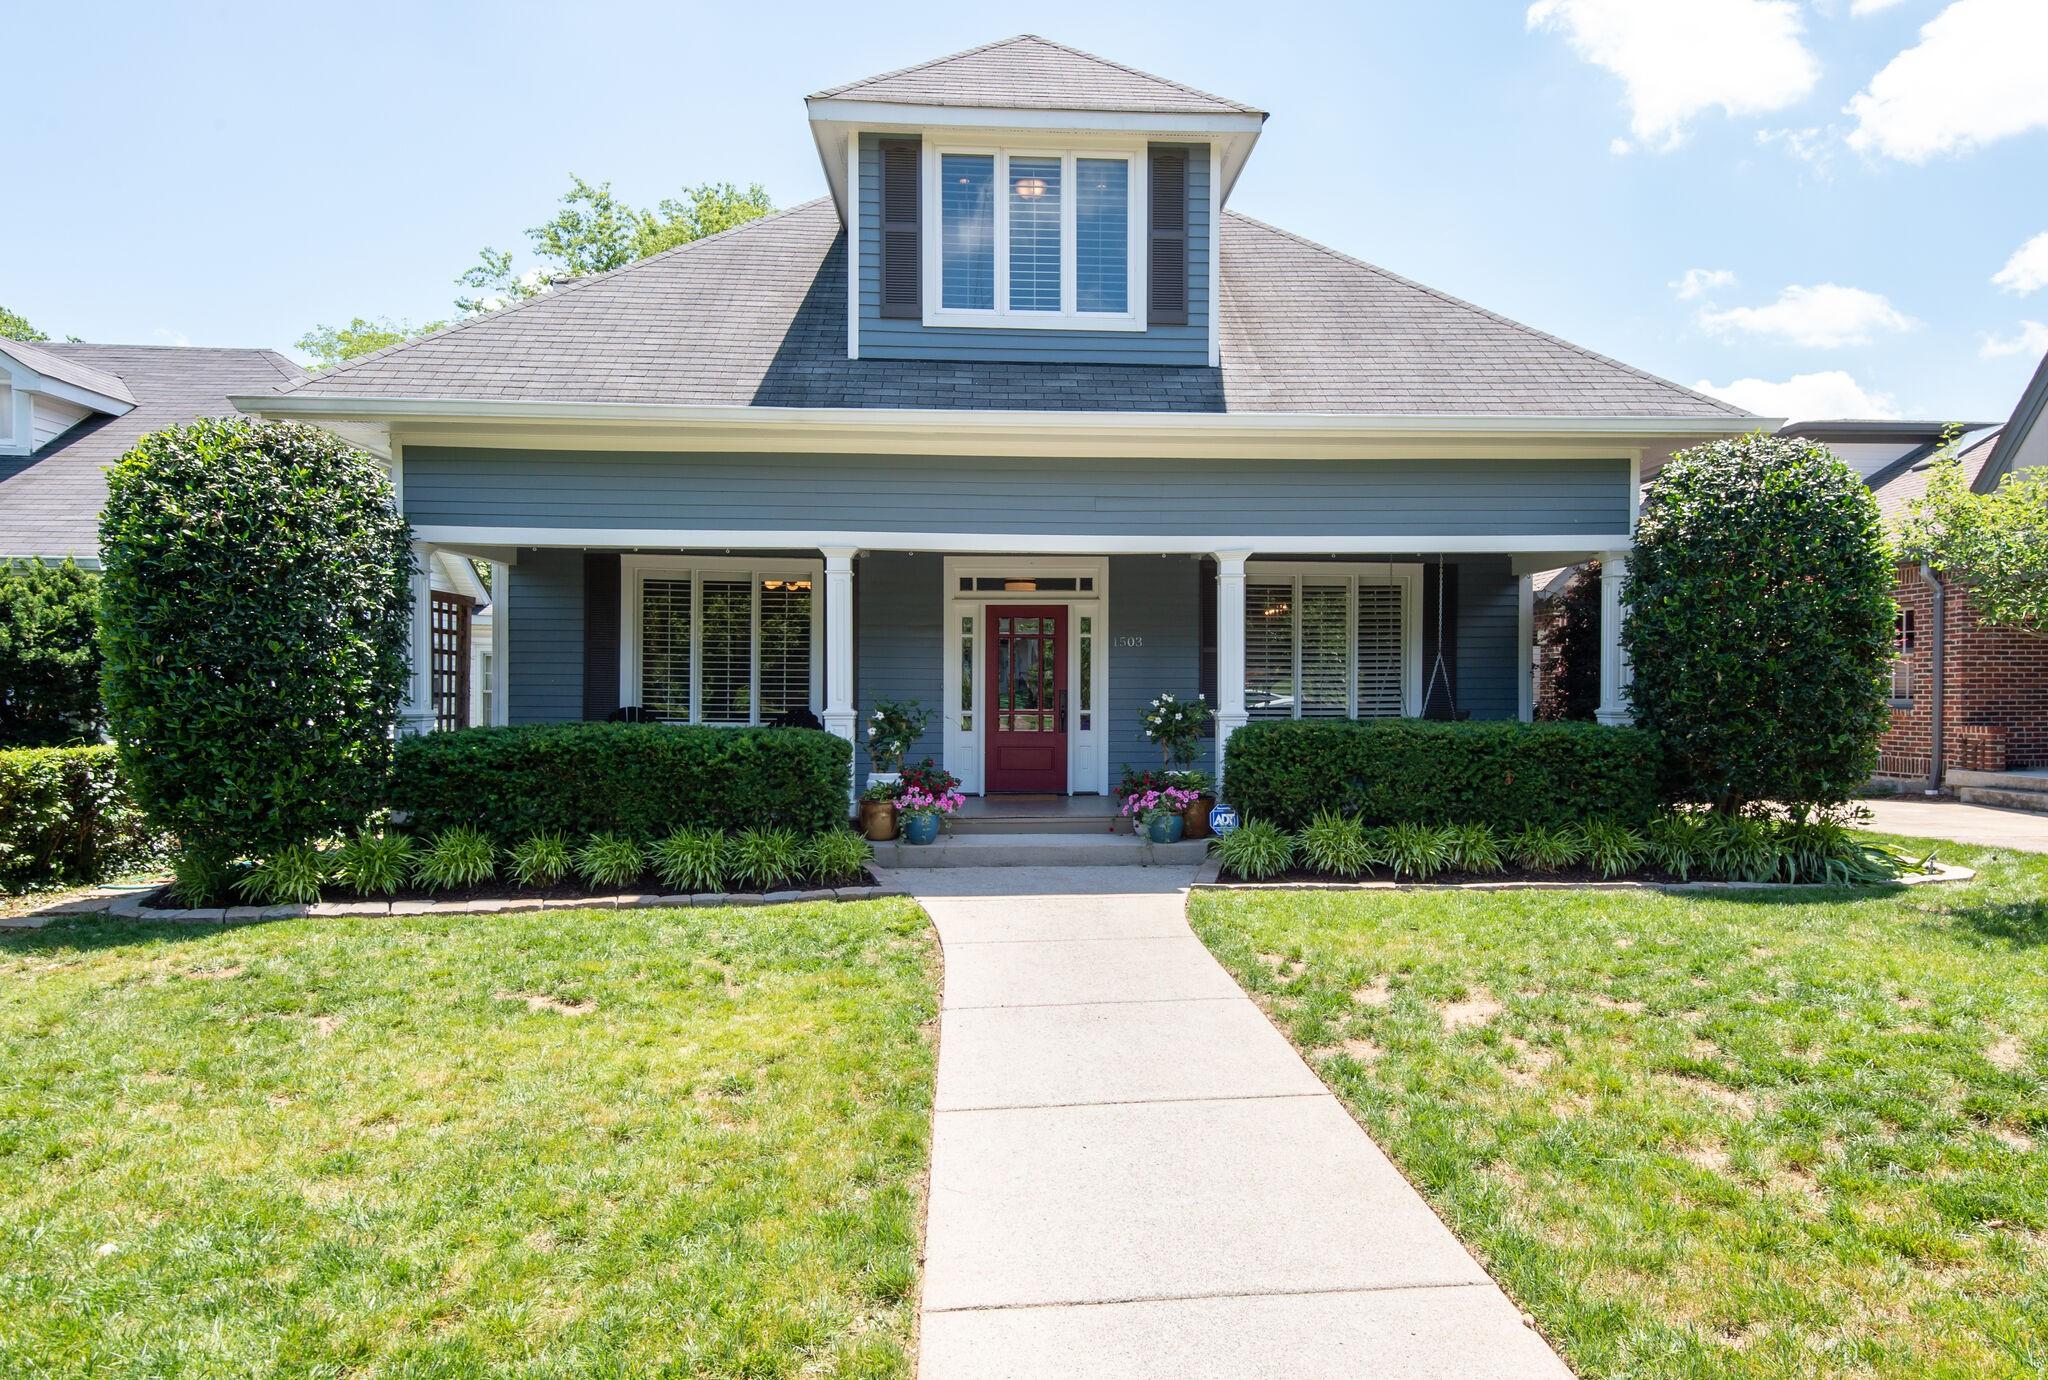 1503 Elmwood Ave Property Photo - Nashville, TN real estate listing